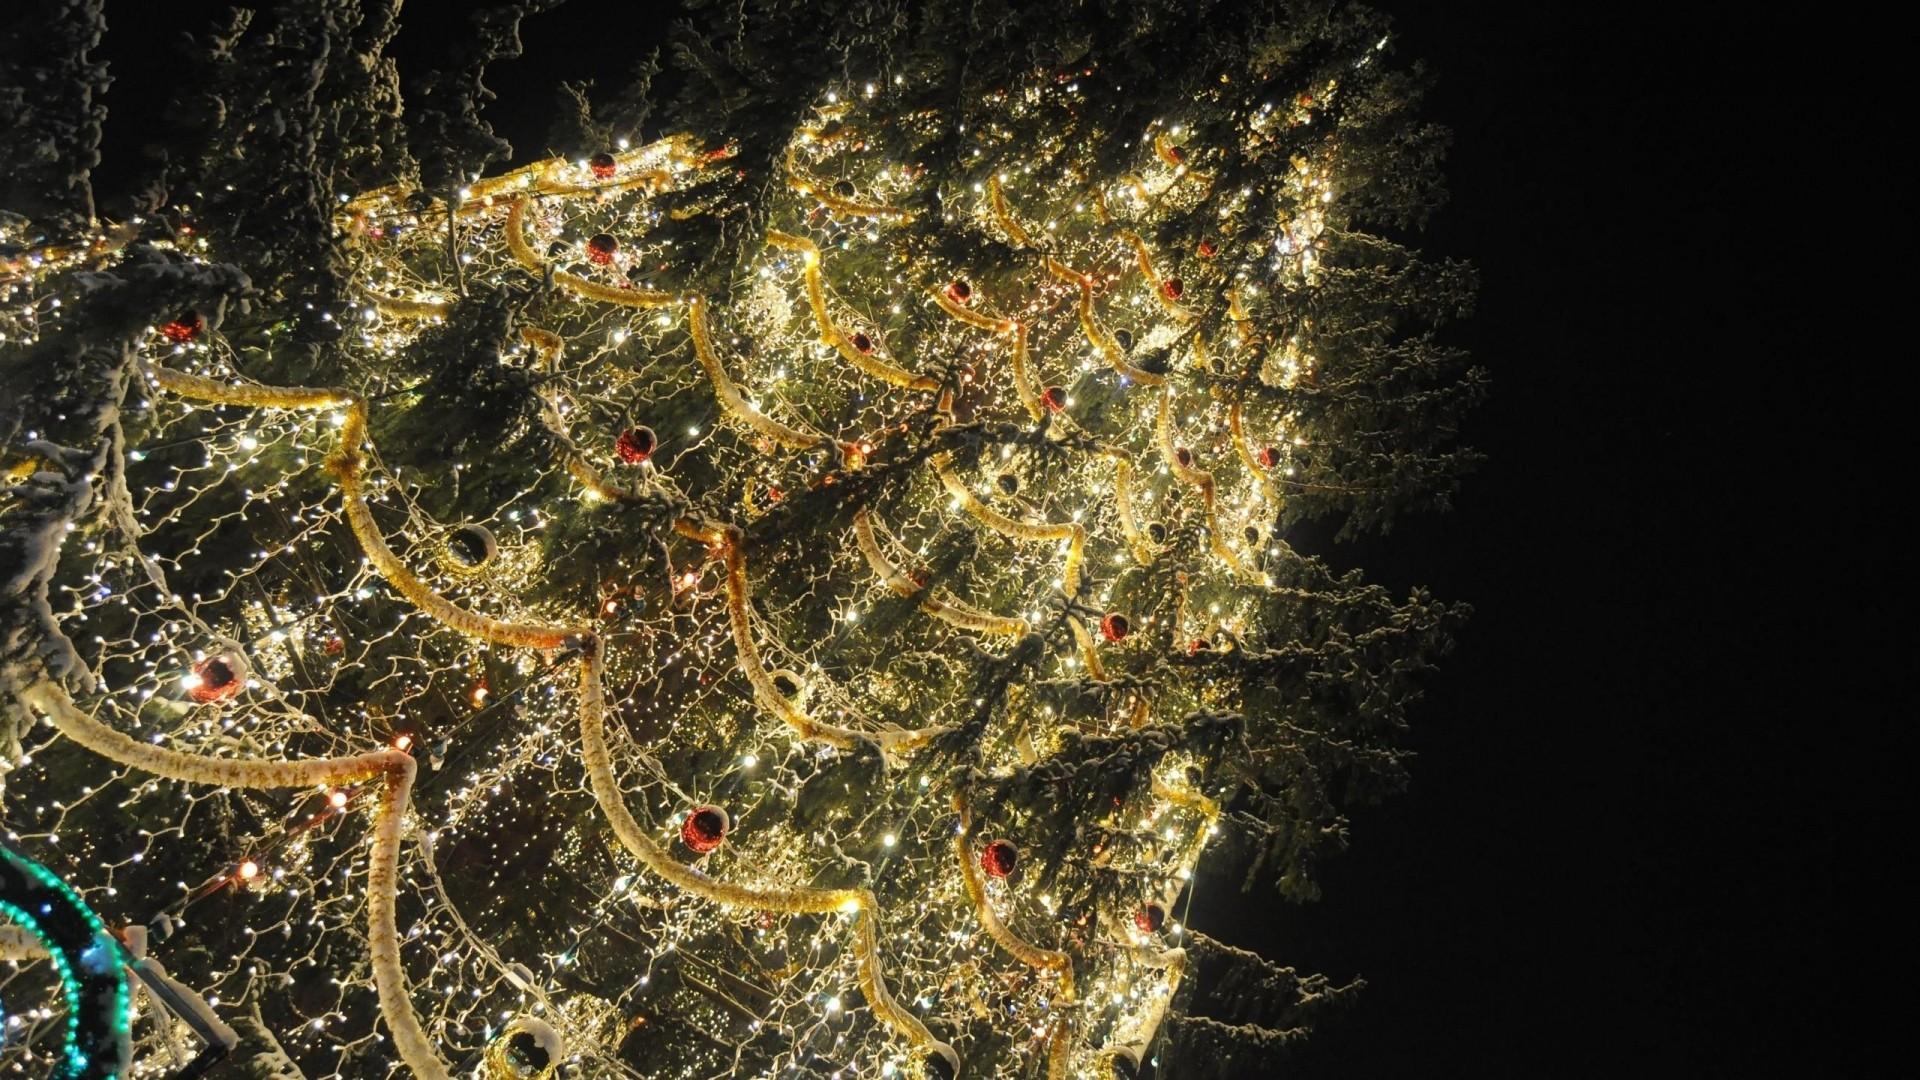 … Background Full HD 1080p. Wallpaper christmas tree, garland,  tinsel, ornaments, night